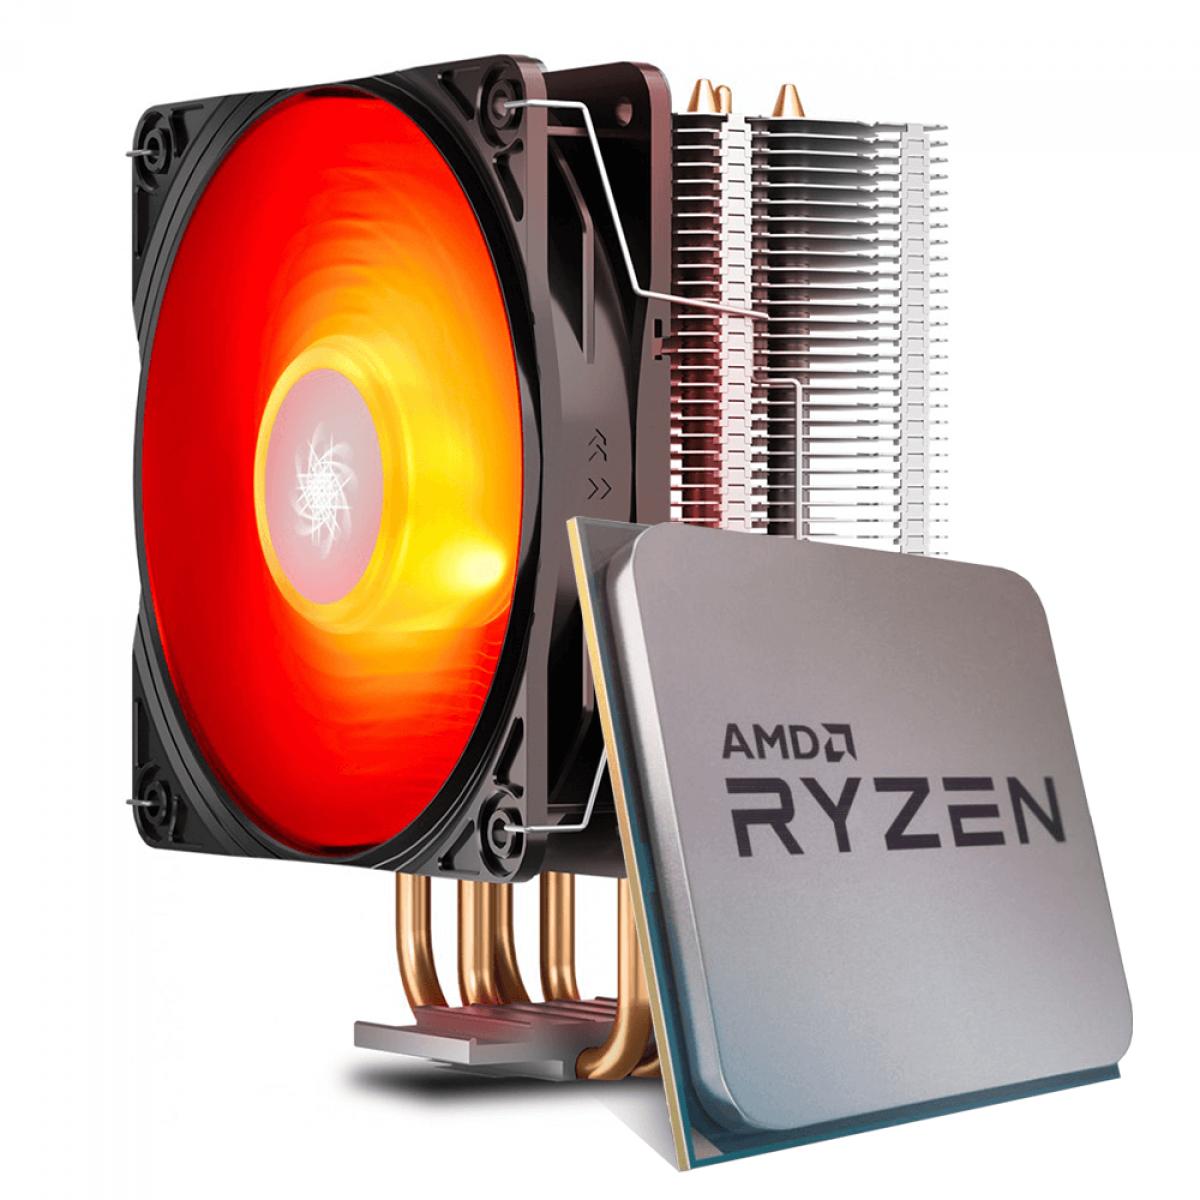 Processador AMD Ryzen 7 2700 3.2GHz / 4.1GHz Max Turbo Octa Core 16MB + Cooler Deepcool Gammaxx 400 V2